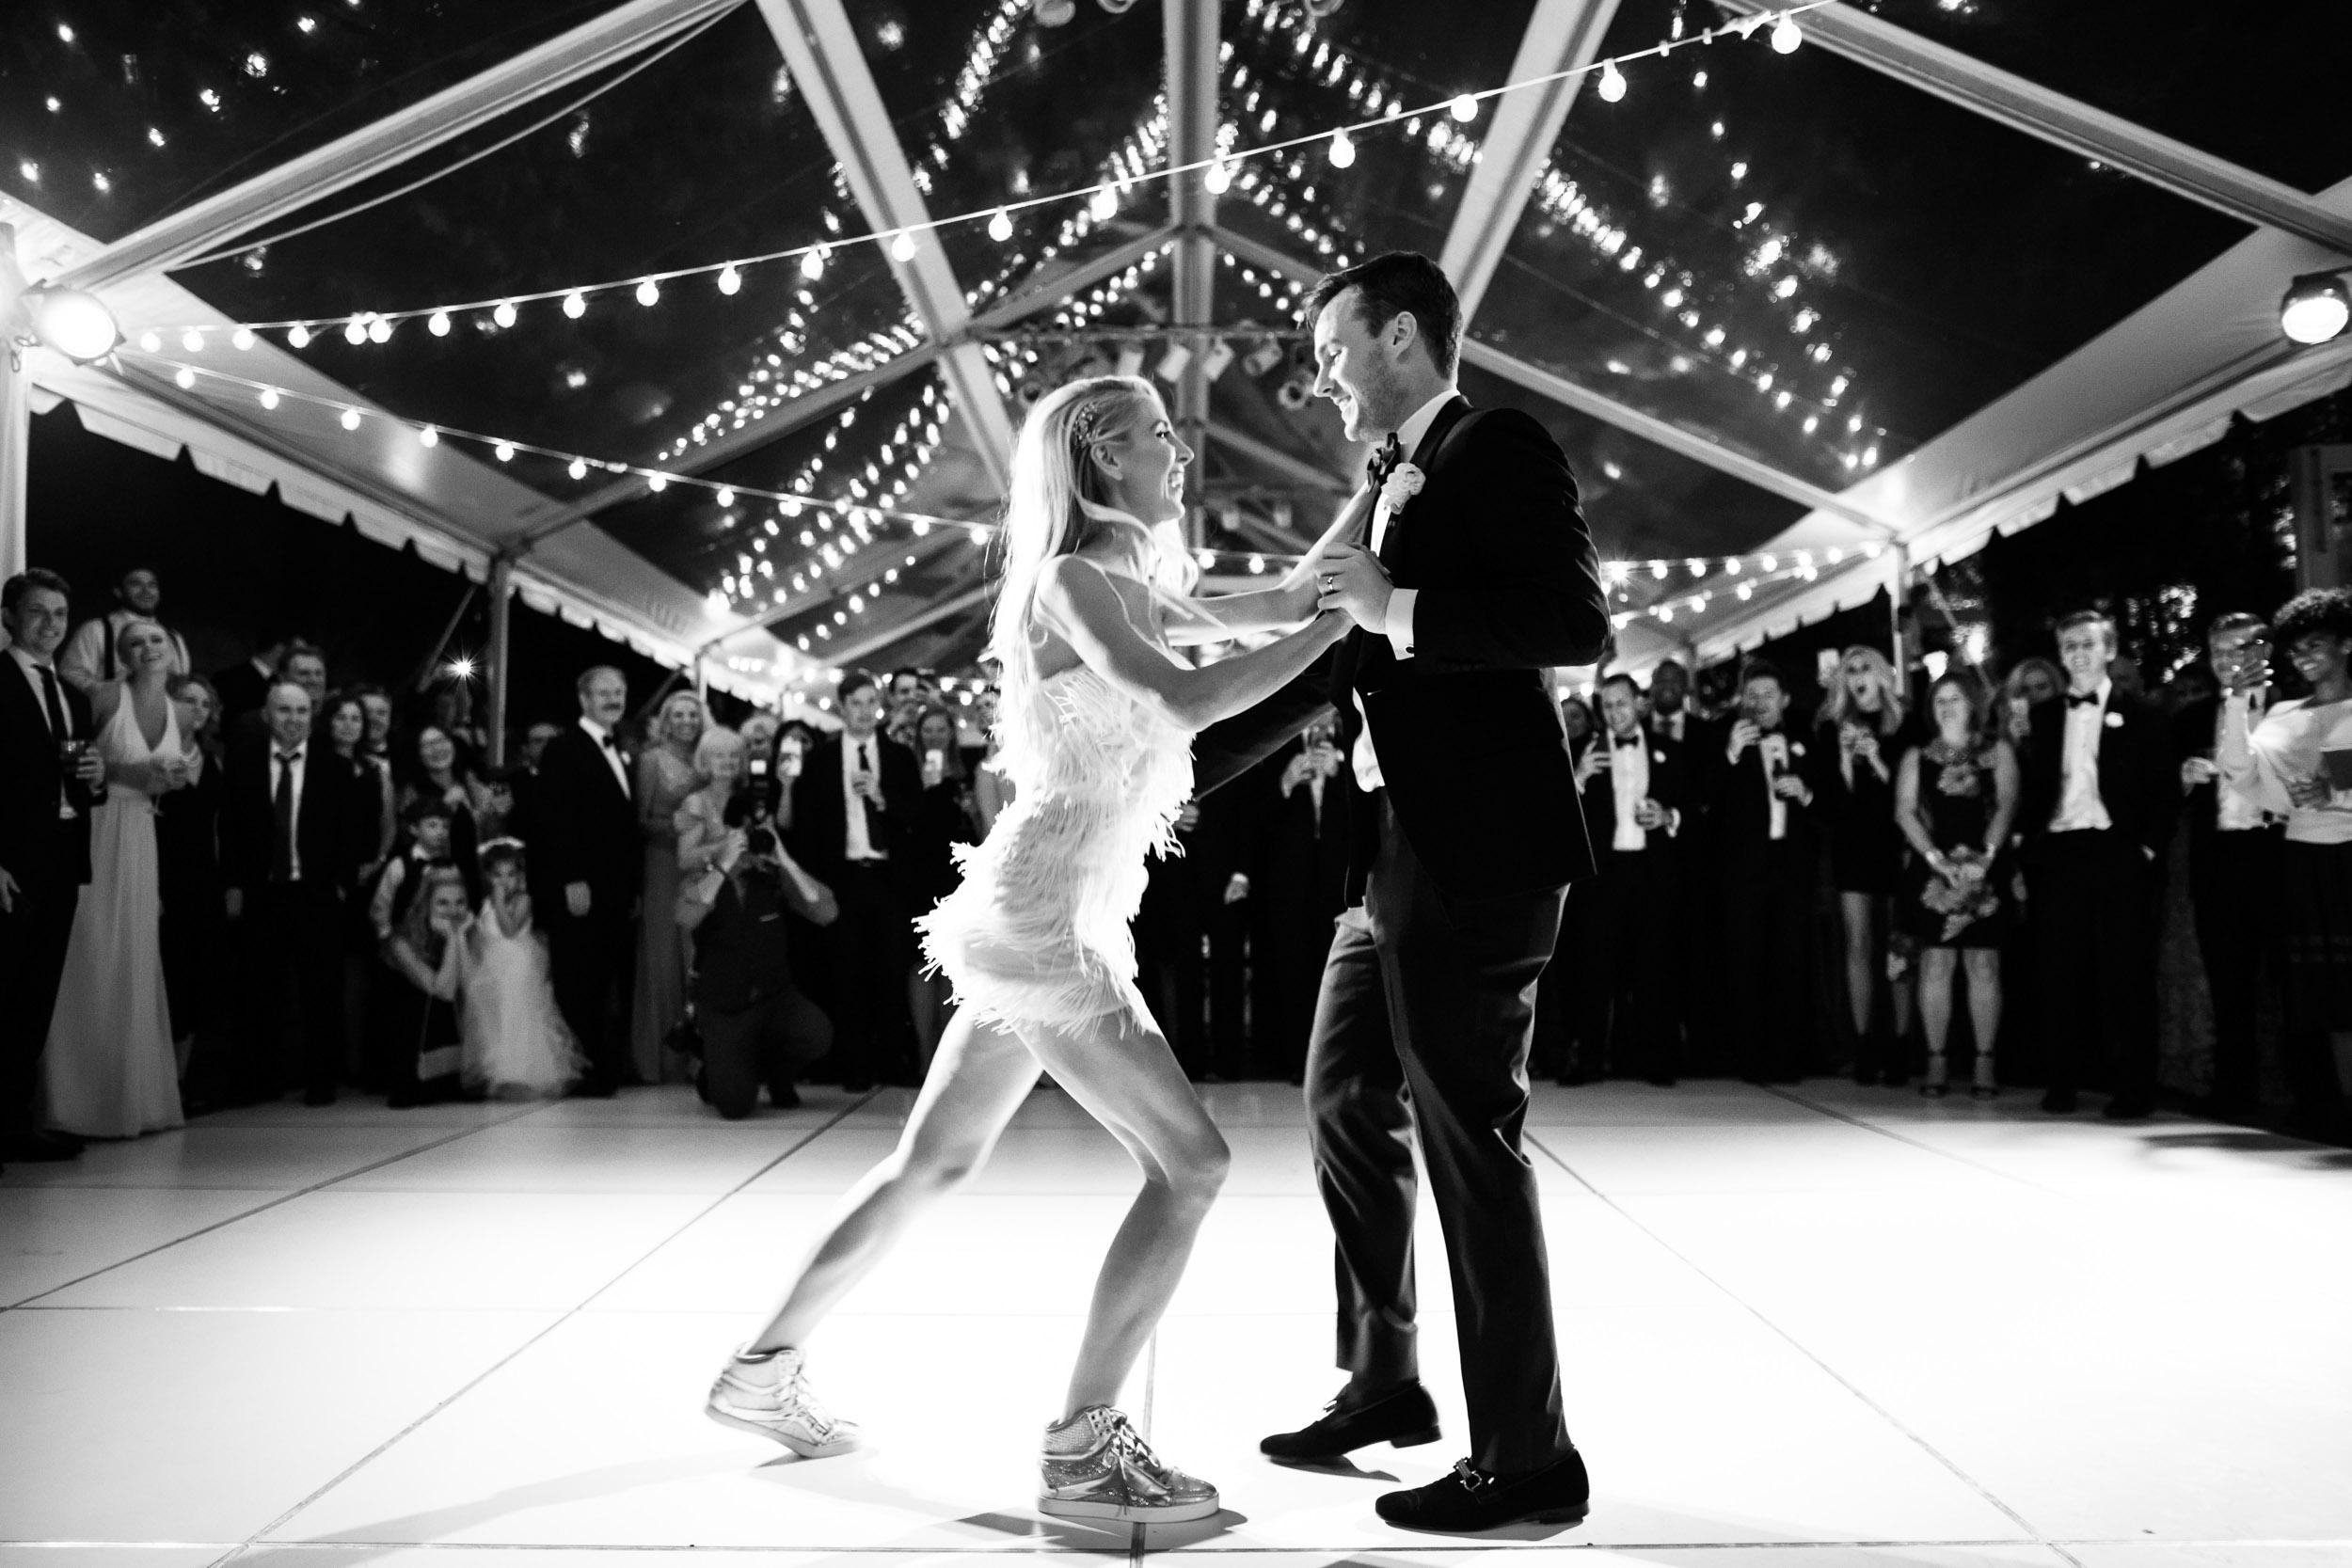 chicago-illuminating-co-wedding-photos-76.jpg